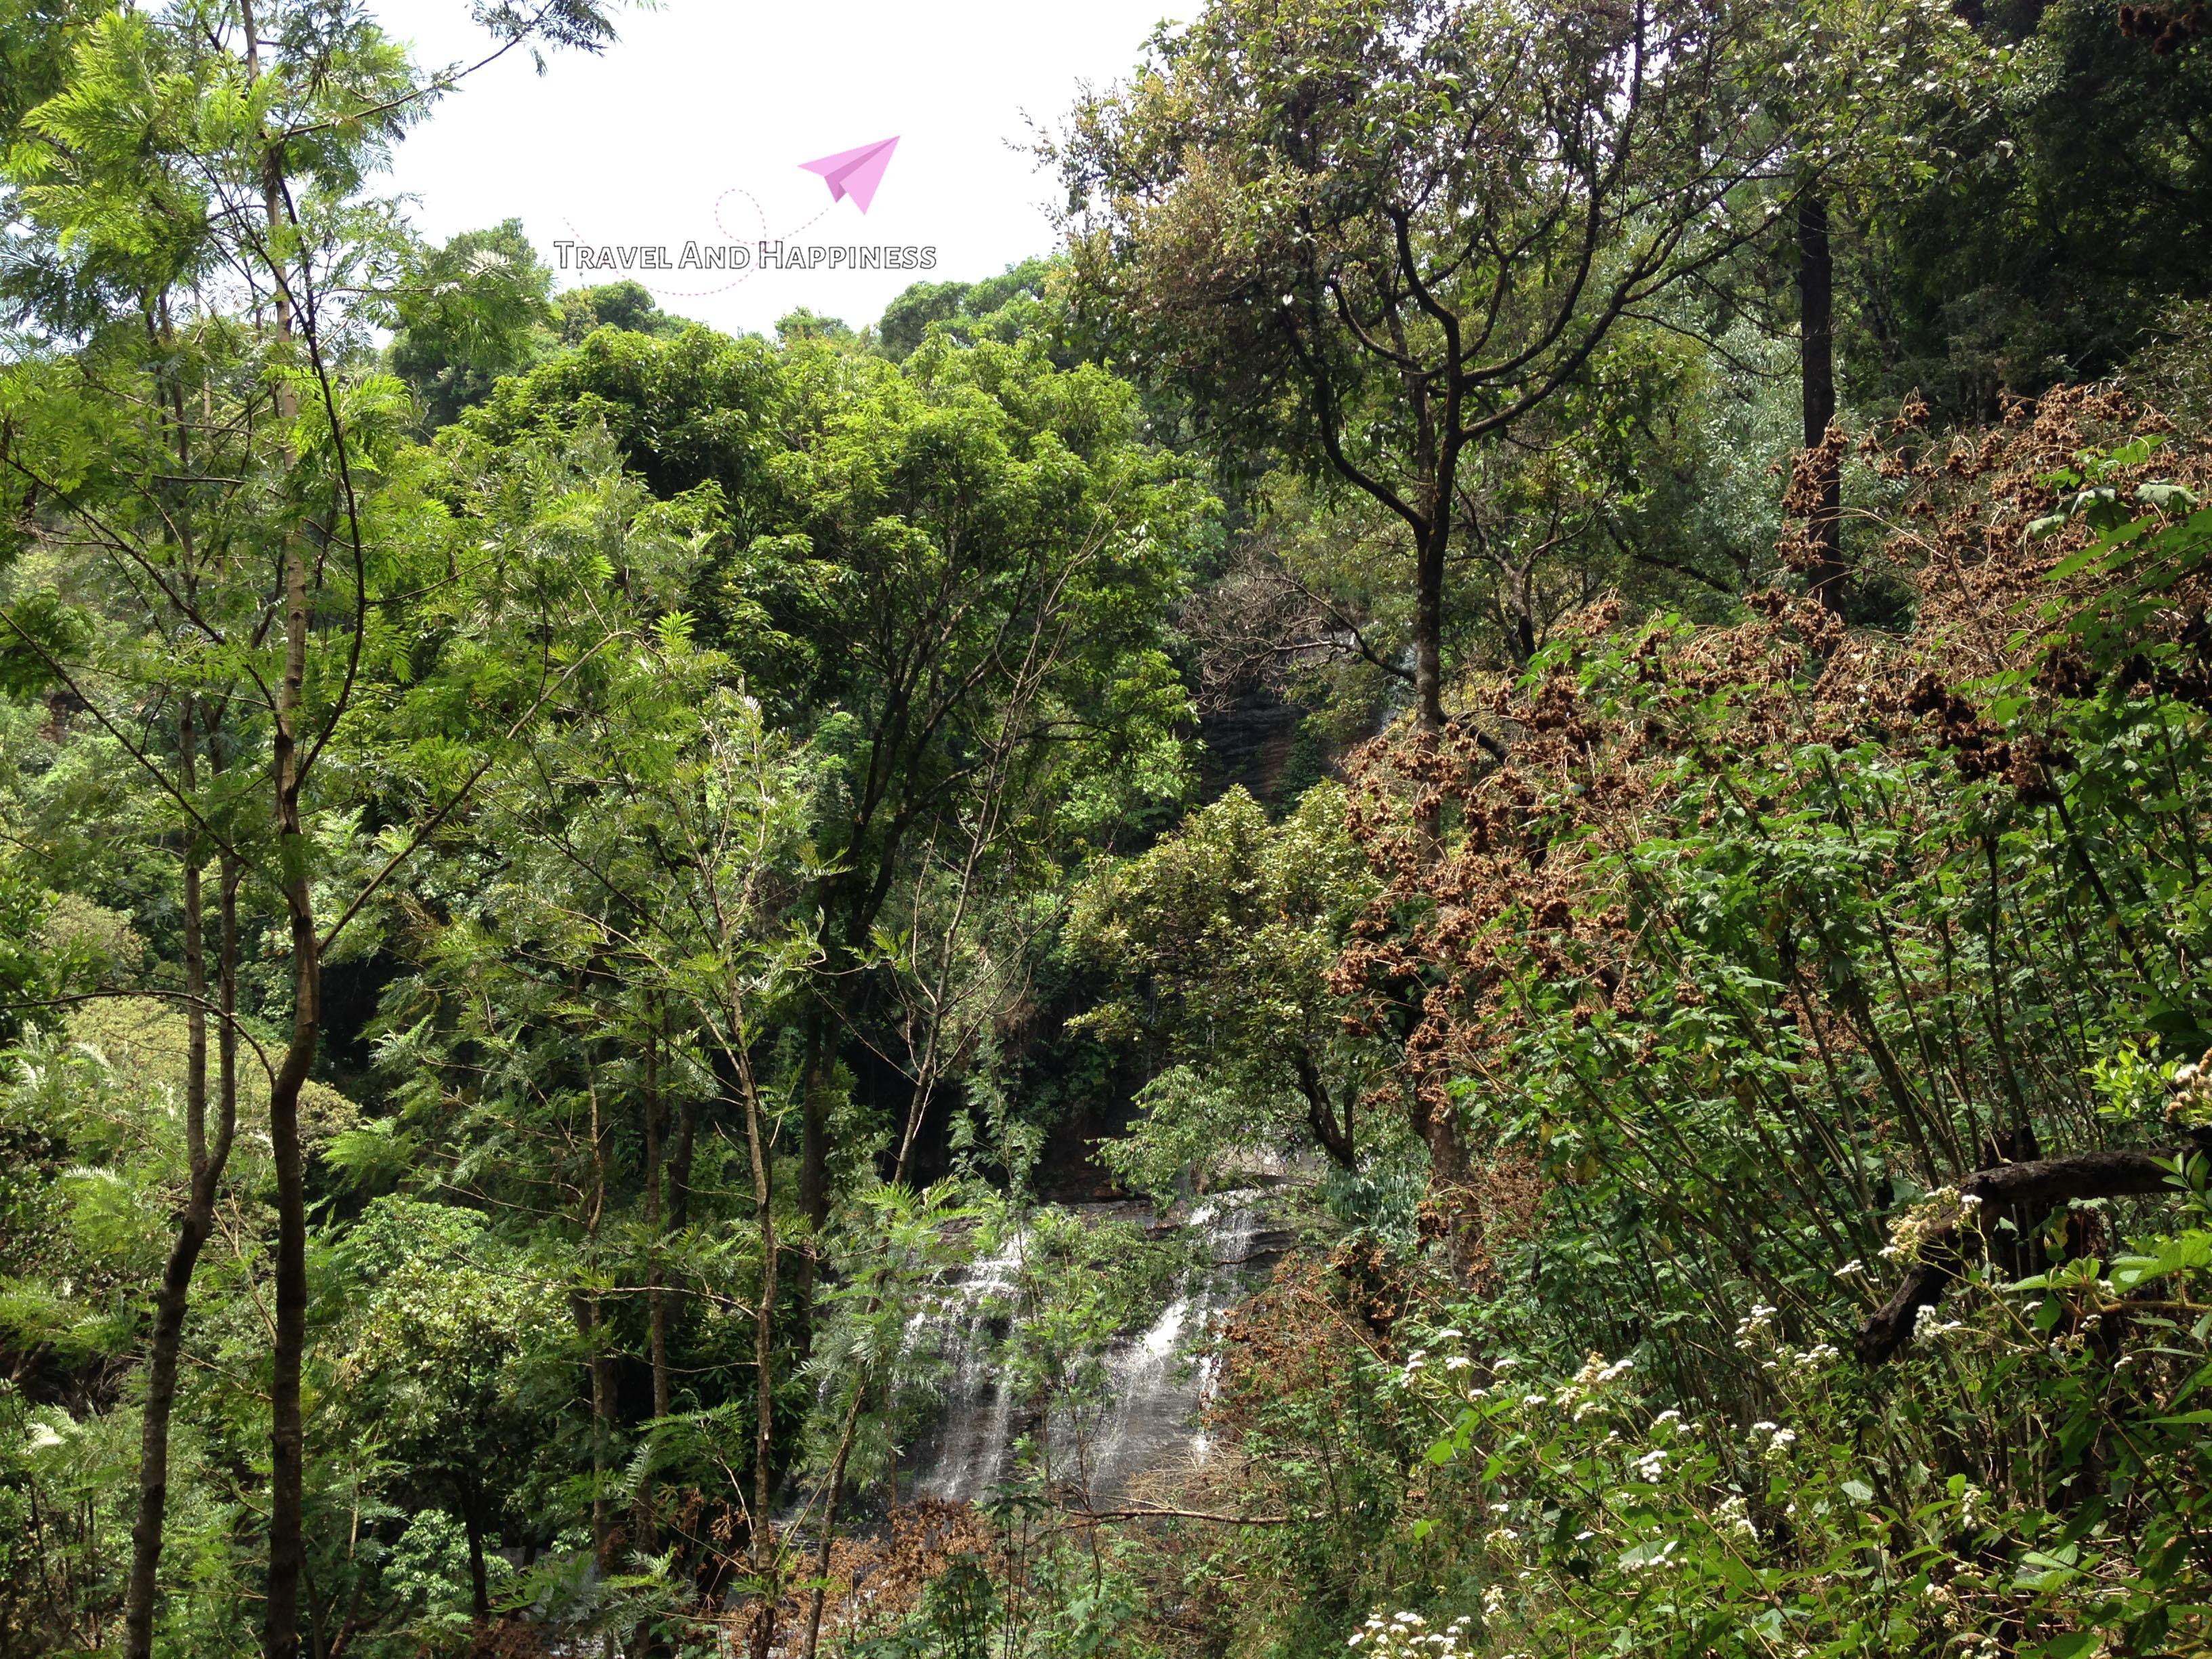 12. First view of Jhari - jeri falls in Chikamagalur